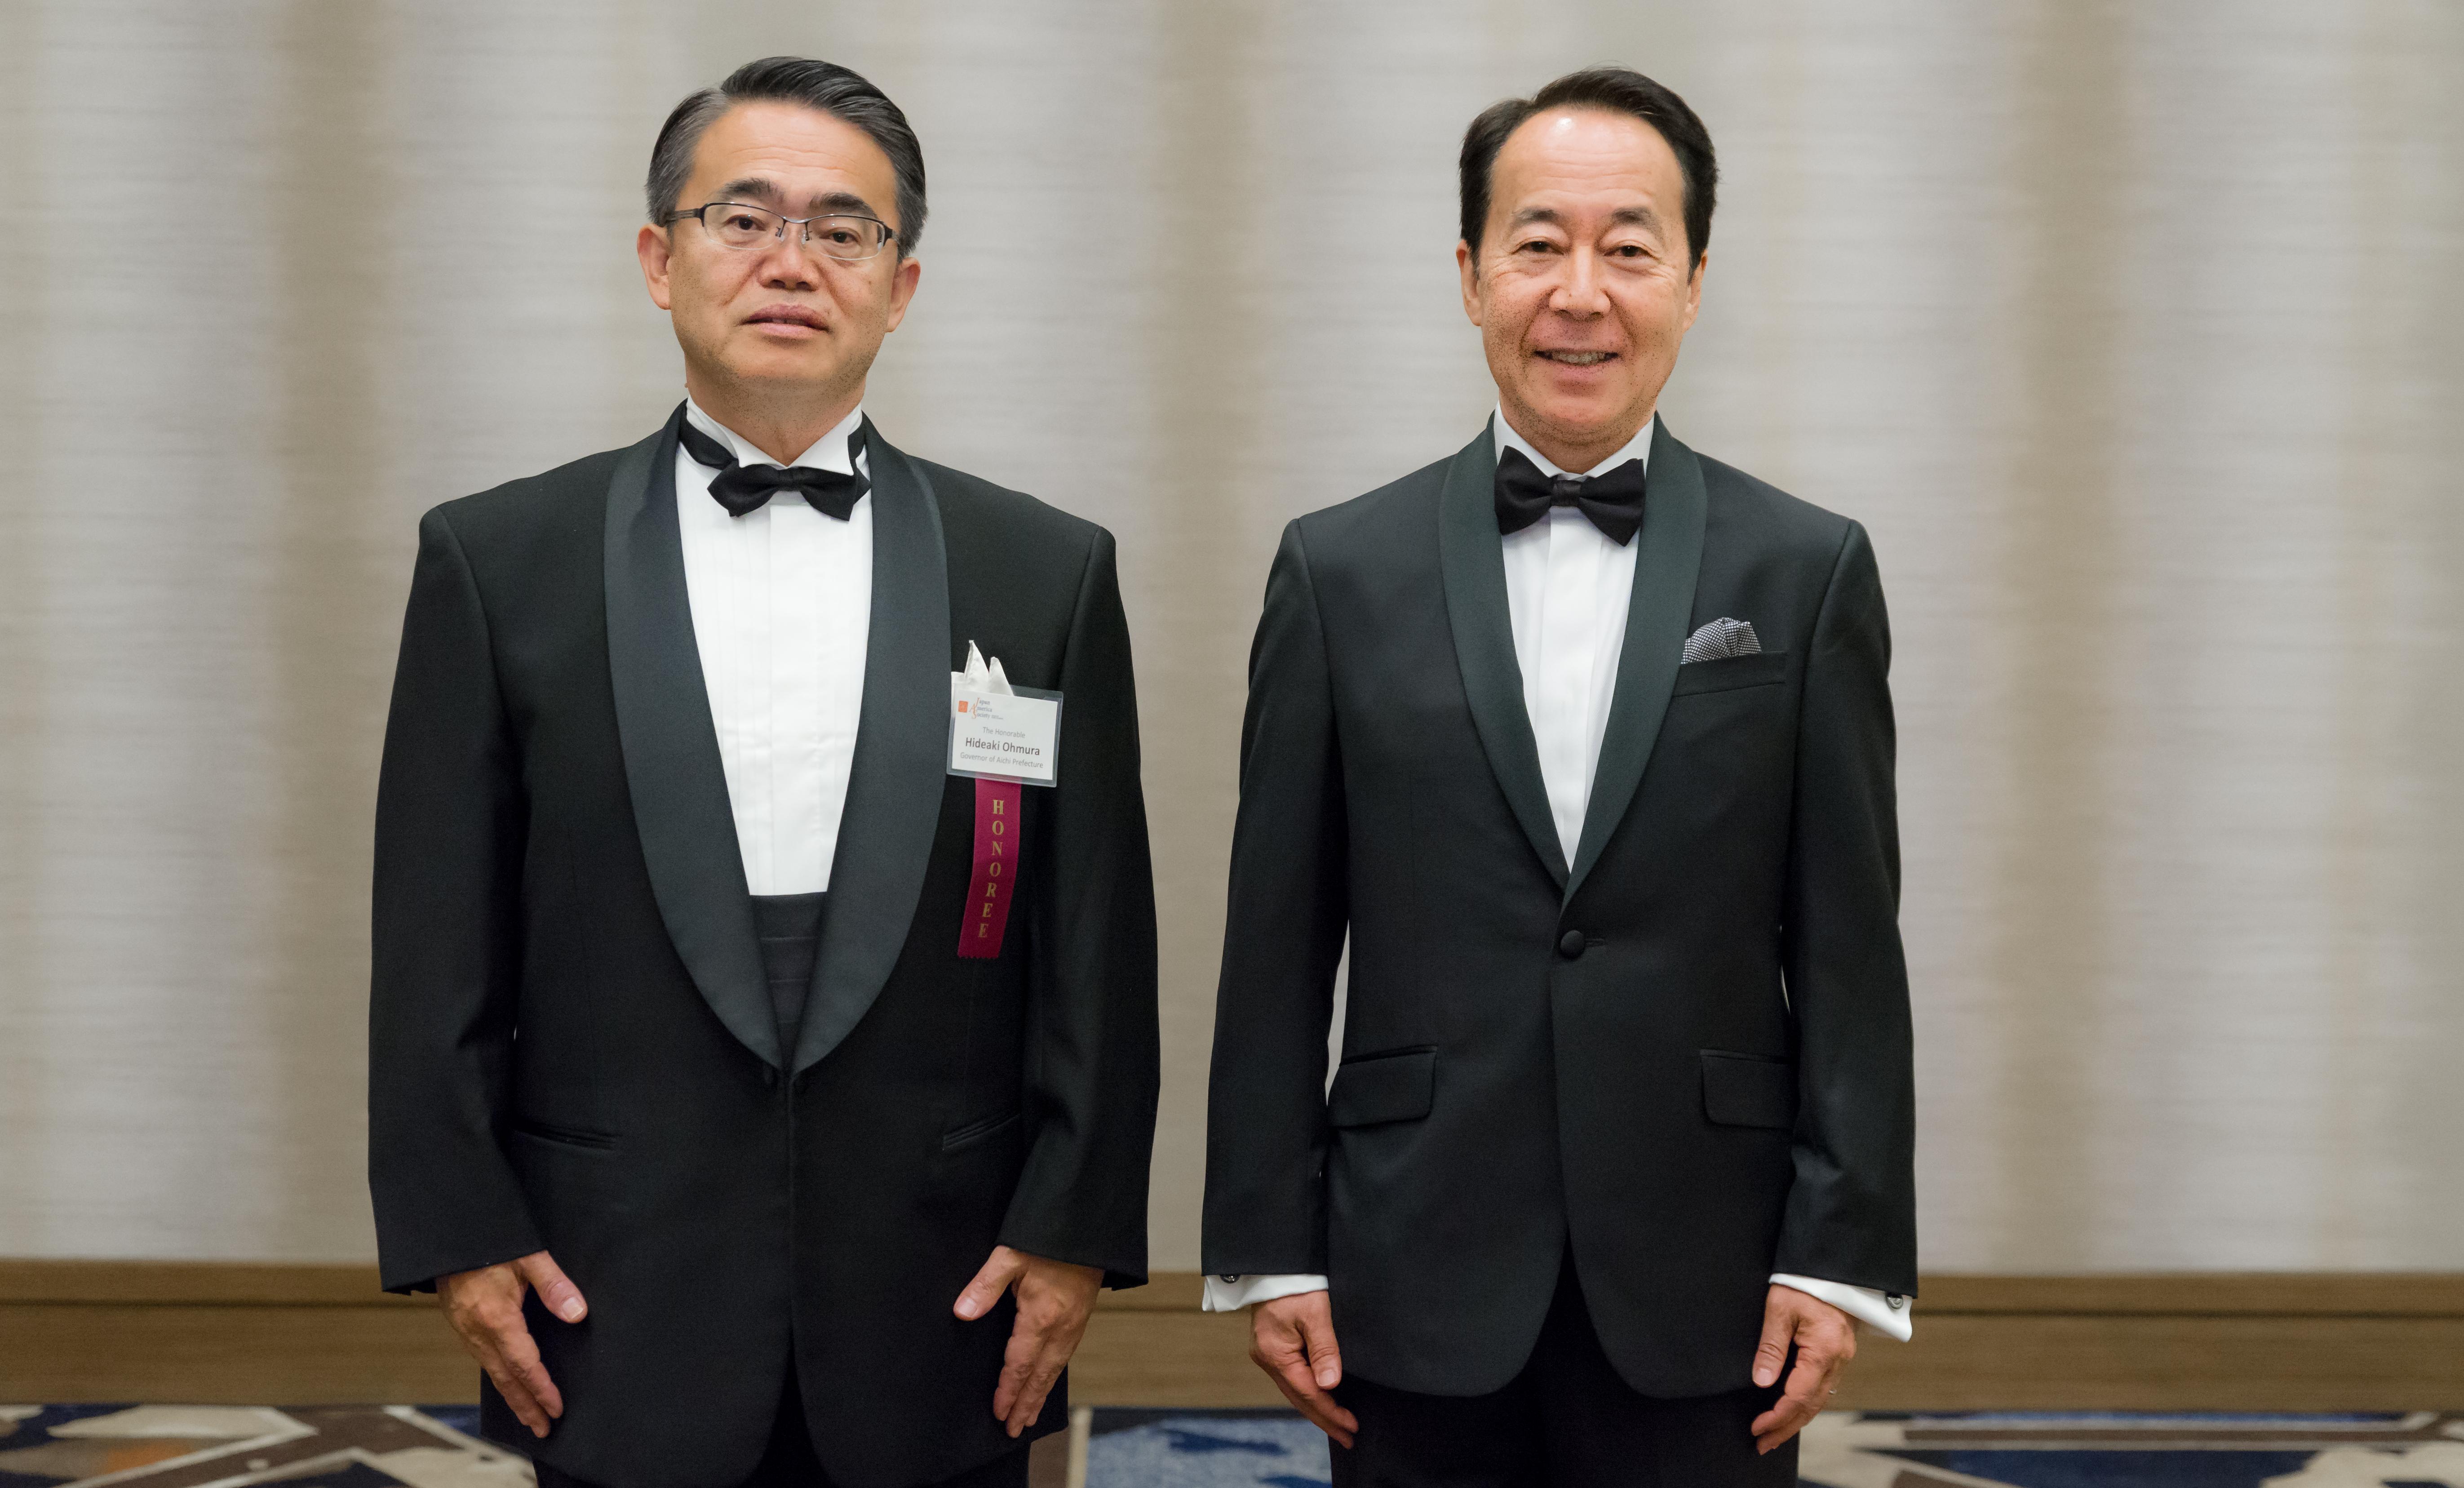 Governor Hideaki Ohmura and Shinsuke Takahasi Honored at Sun & Star Legacy Award Dinner